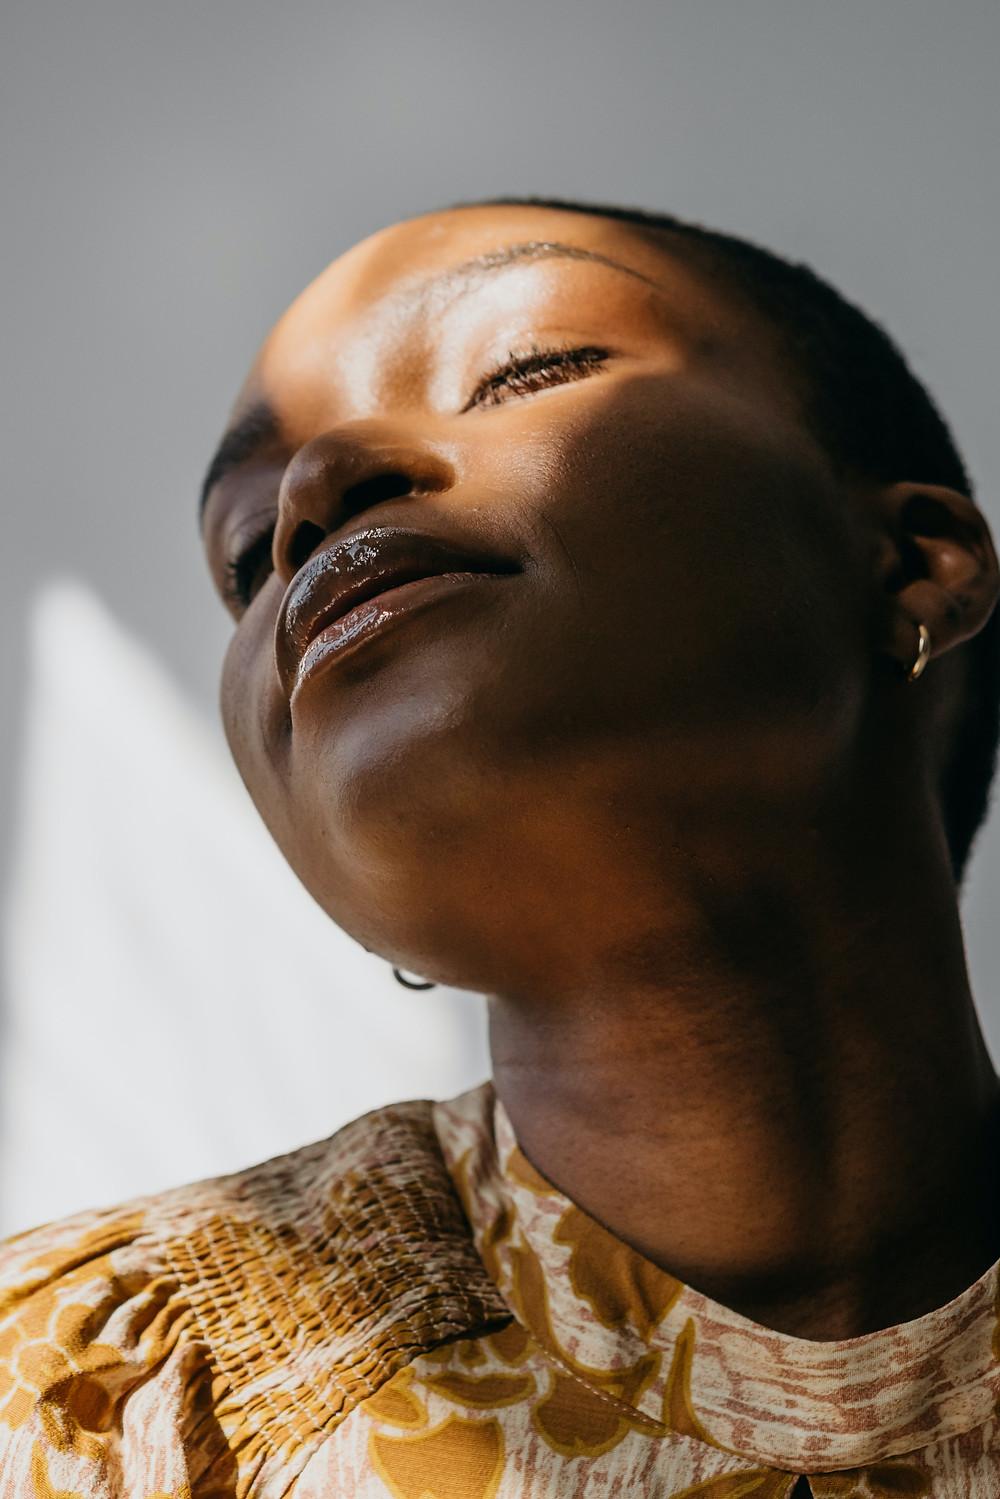 Black woman under sunlight in the shade, sunrays